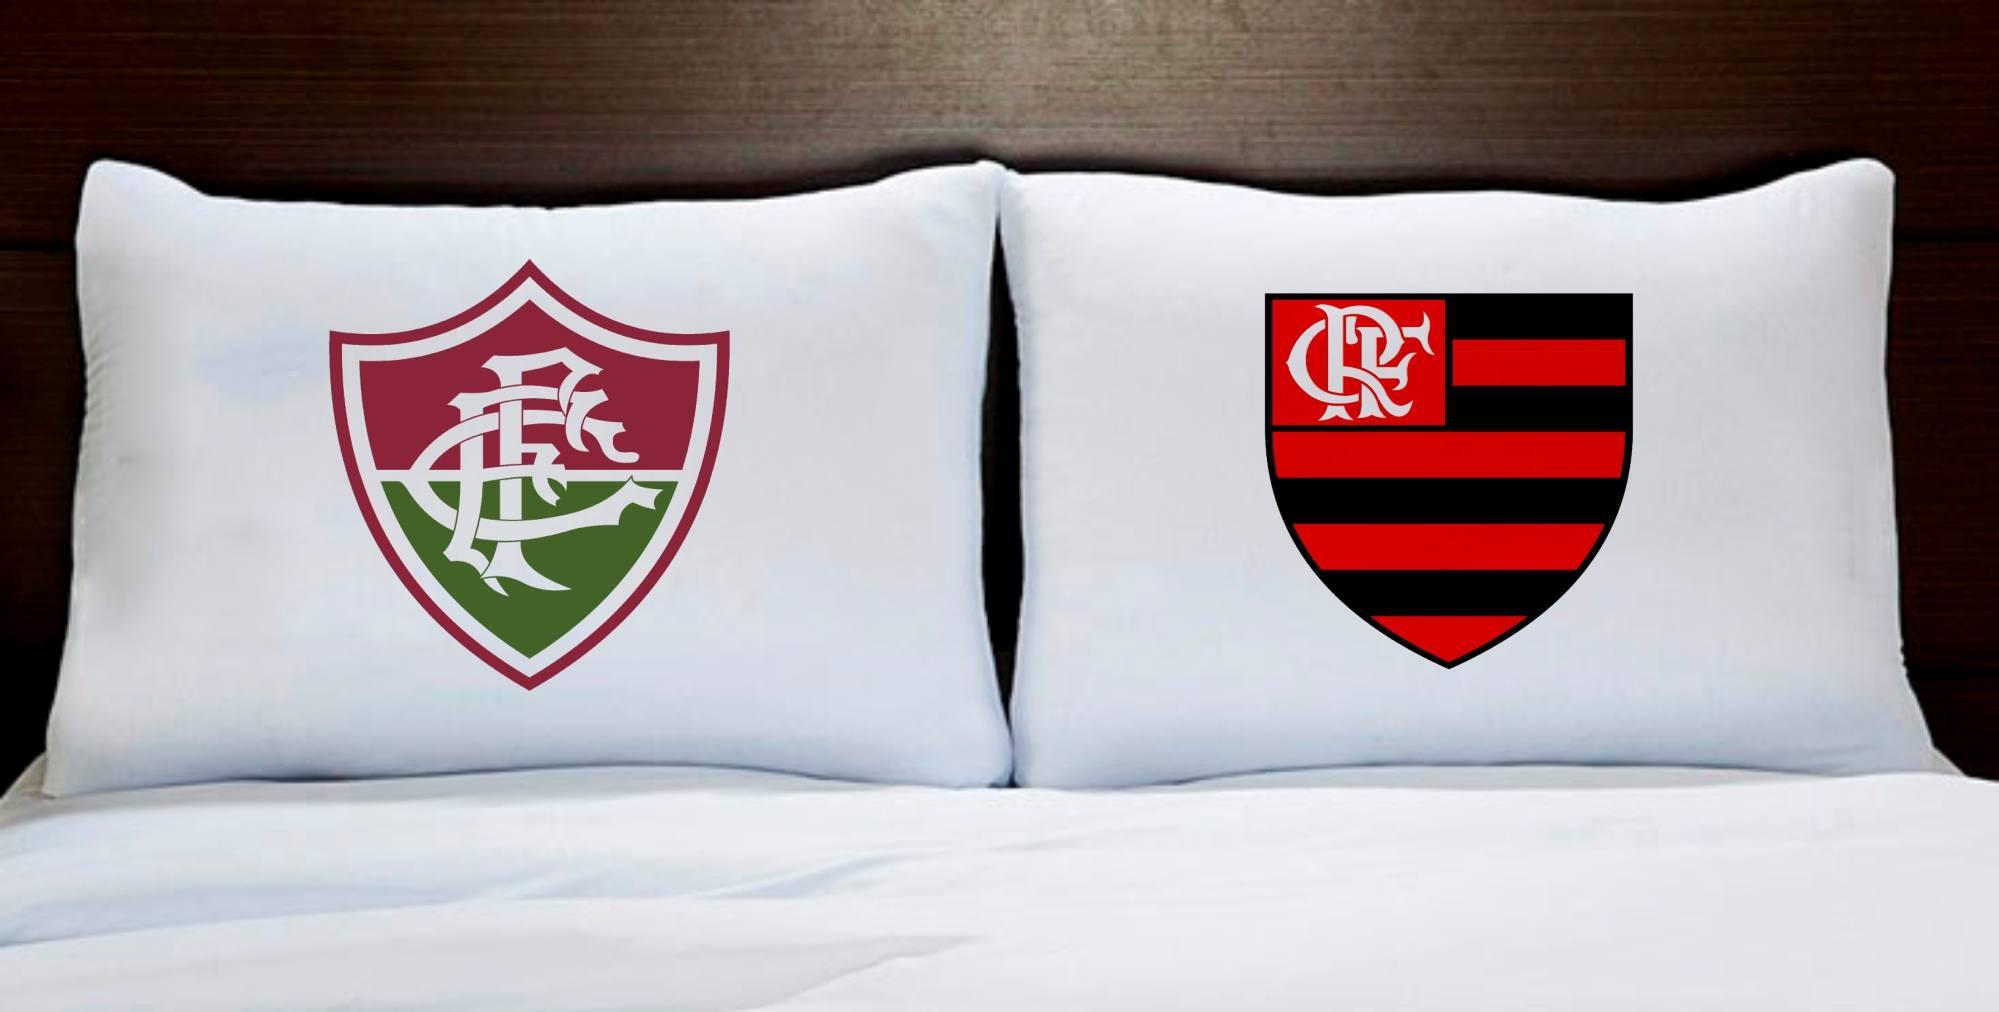 824cba2aa6 Fronhas Casal Fluminense e Flamengo Times de Futebol - Empório Camiseteria